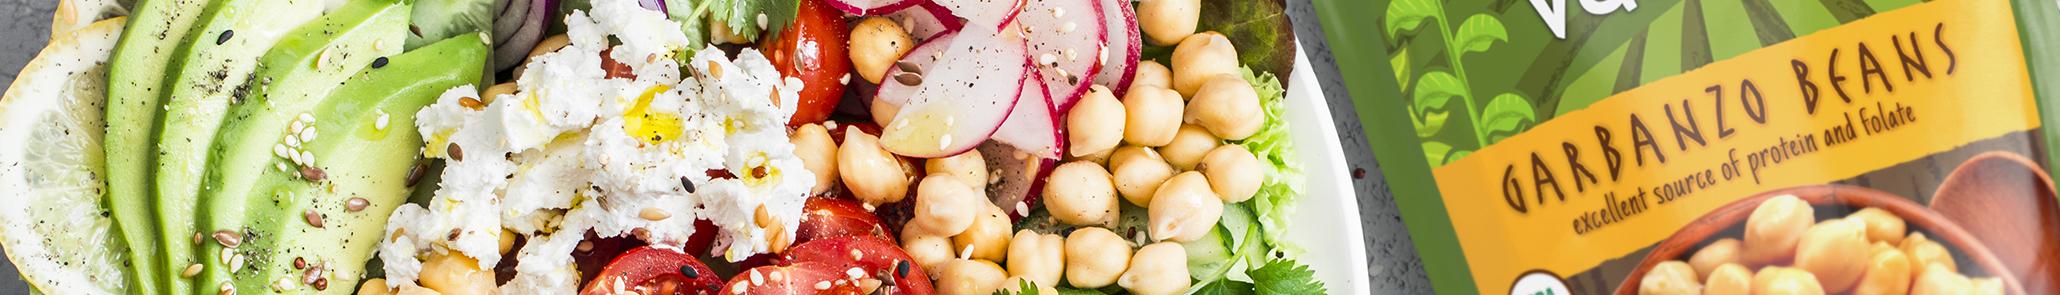 Start Living the Mediterranean Lifestyle